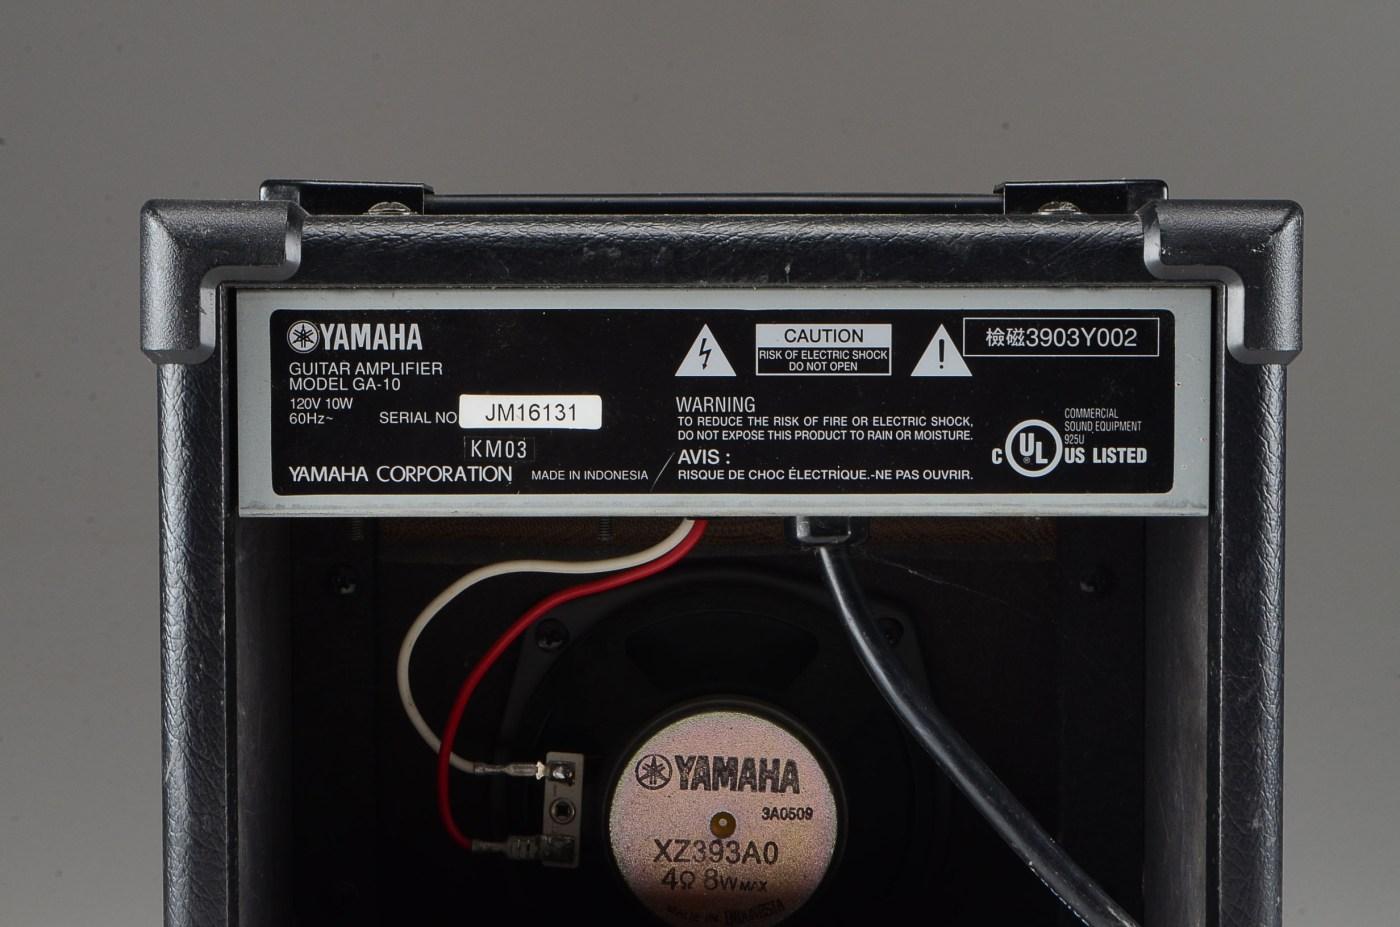 TAY_6681.JPG?ixlib=rb-1.1 Yamaha Ga 10